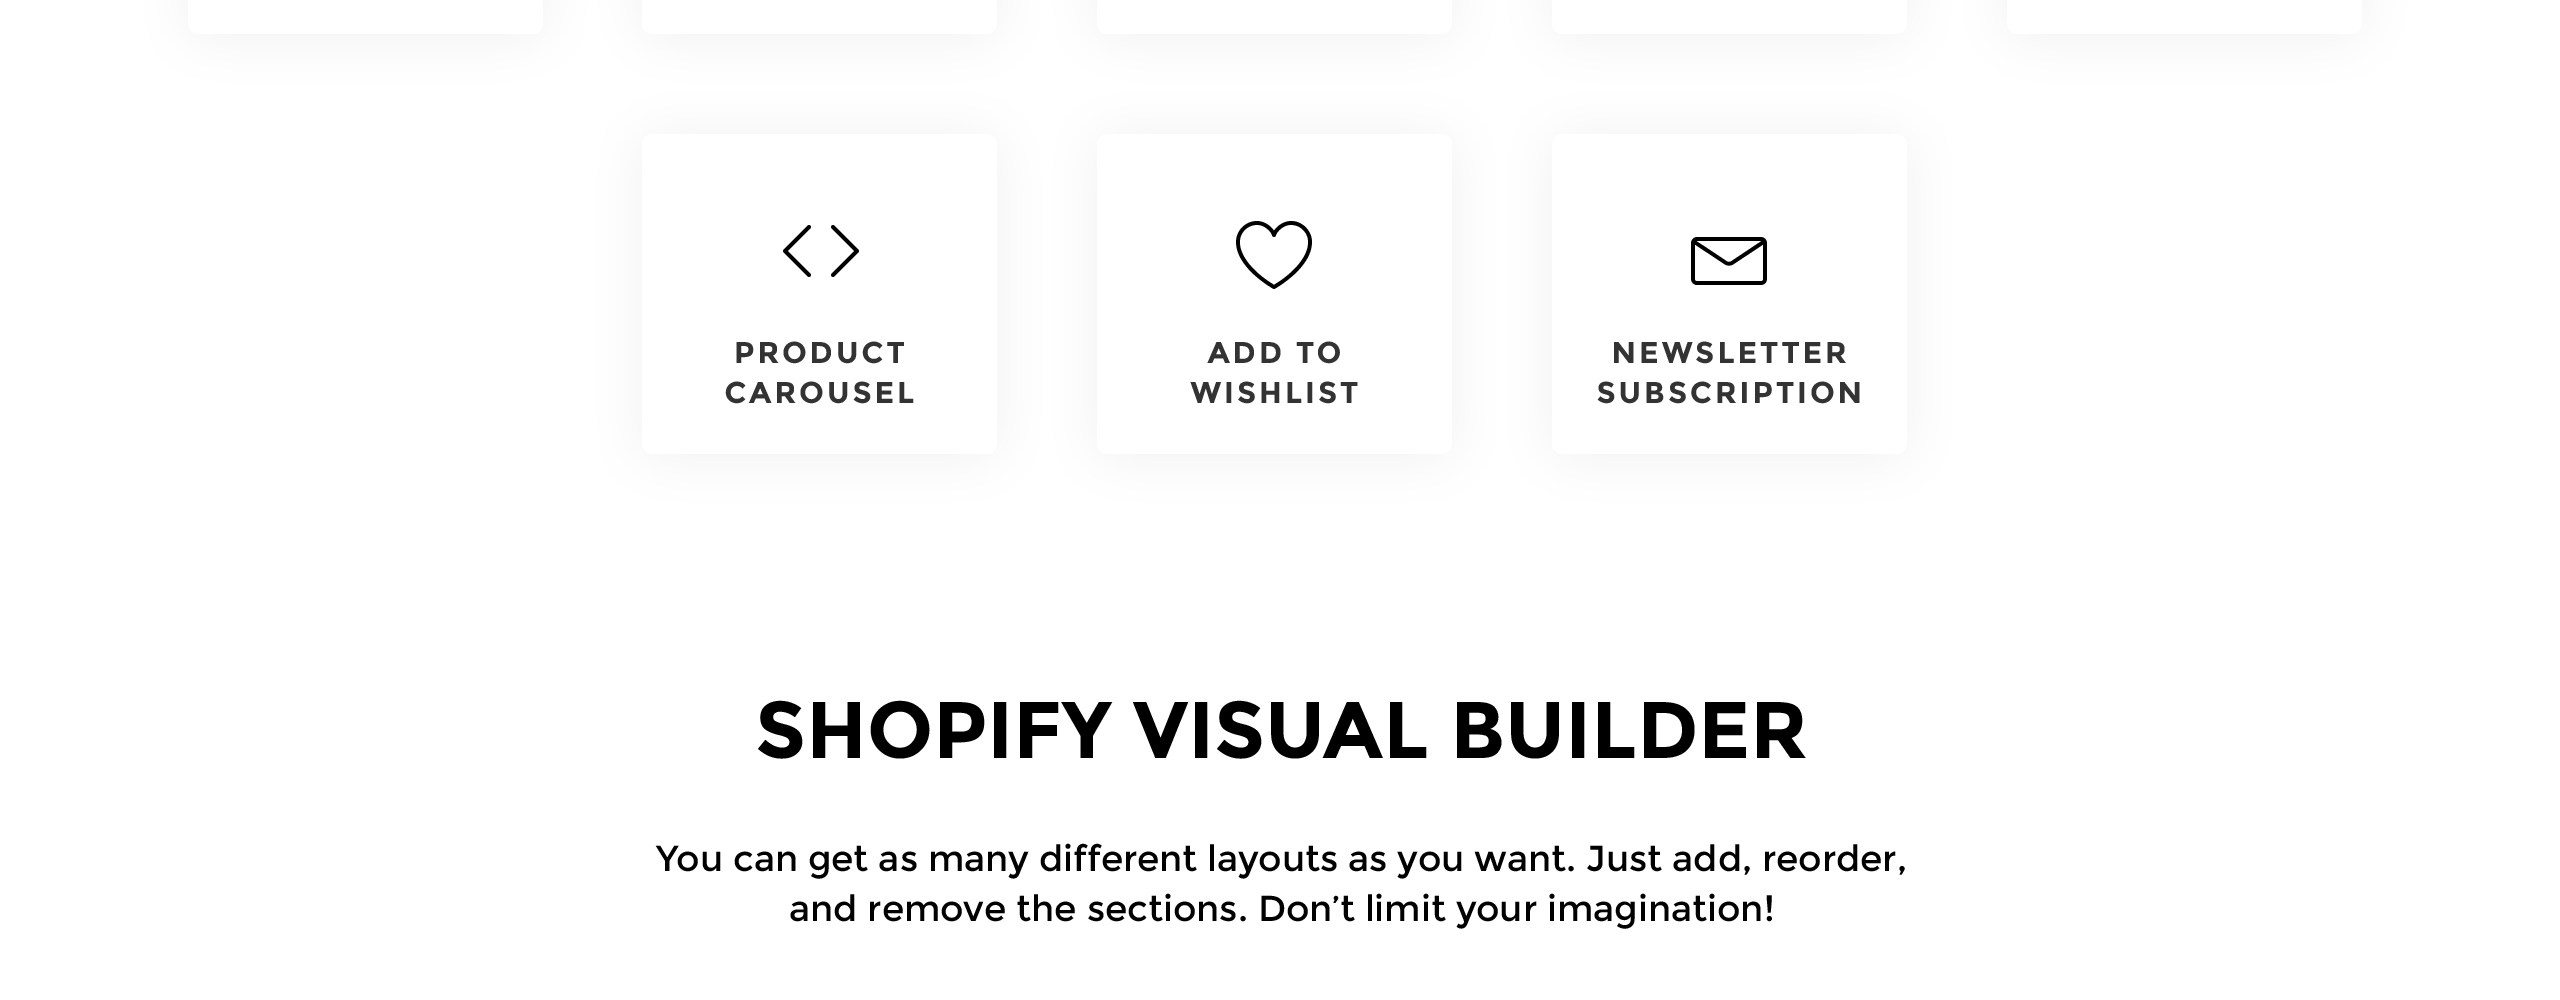 Caviar Store Template Shopify Theme